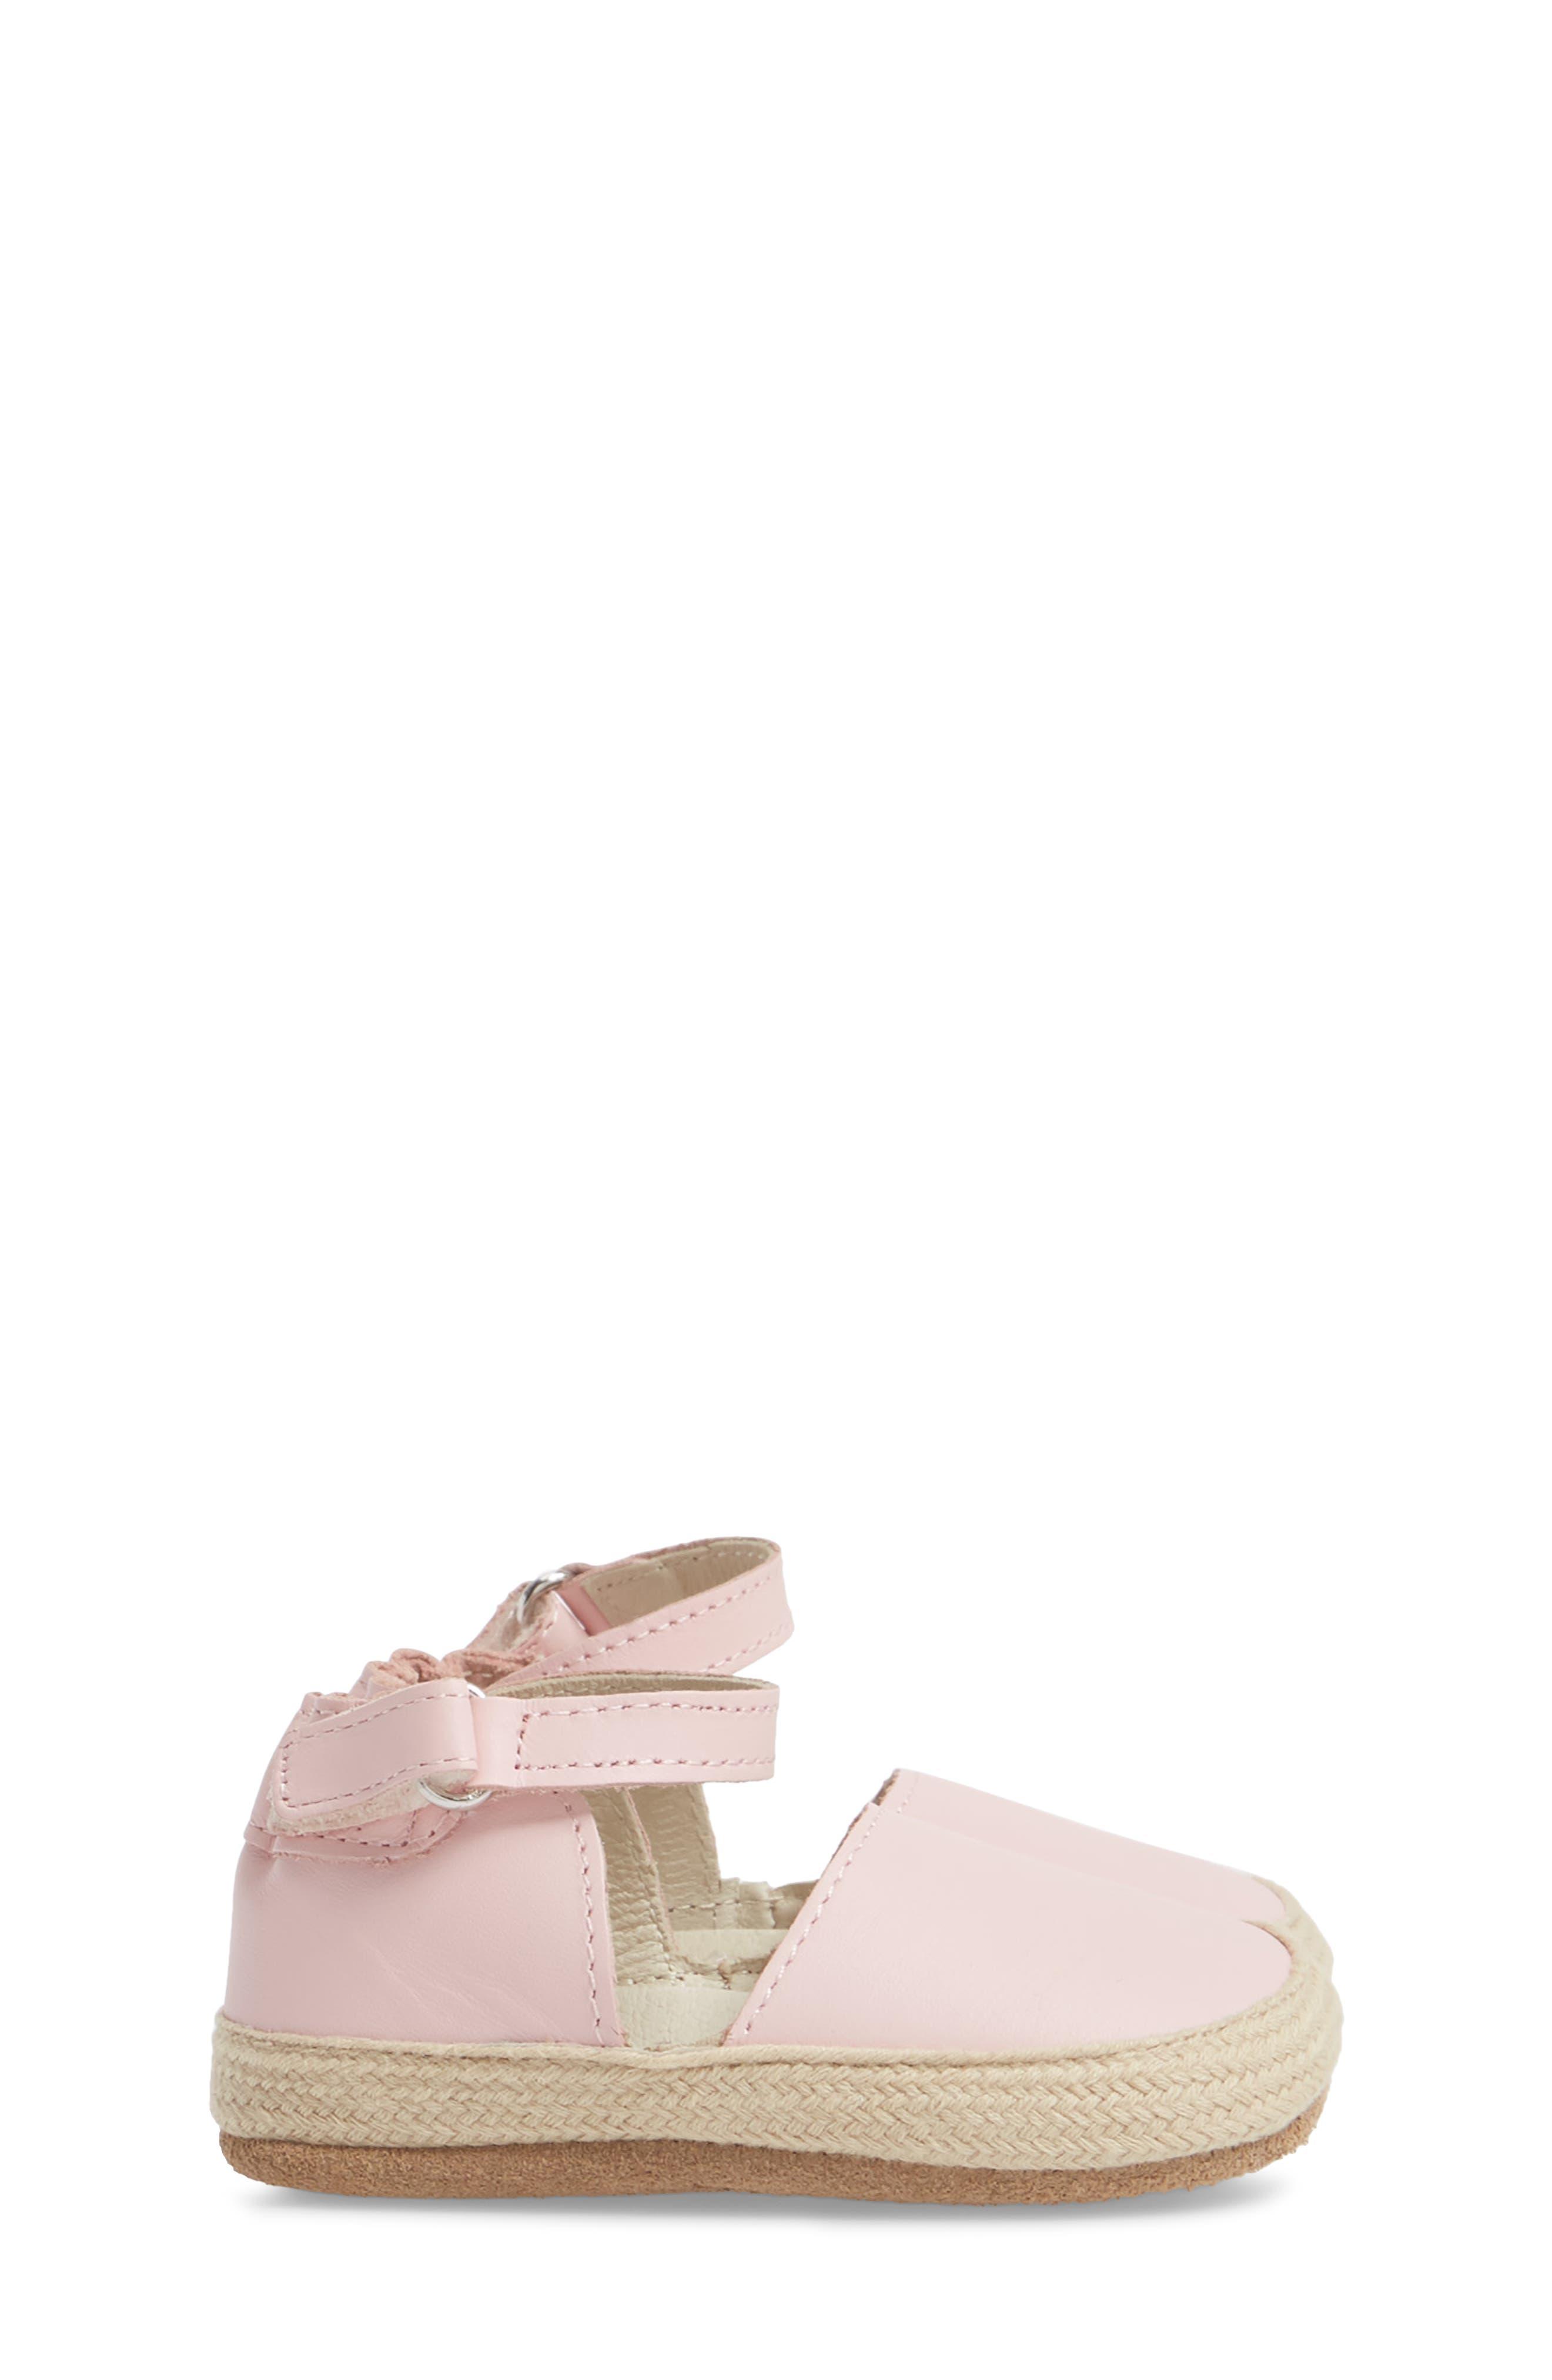 Kelly Soft Sole Espadrille Sandal,                             Alternate thumbnail 4, color,                             Pink